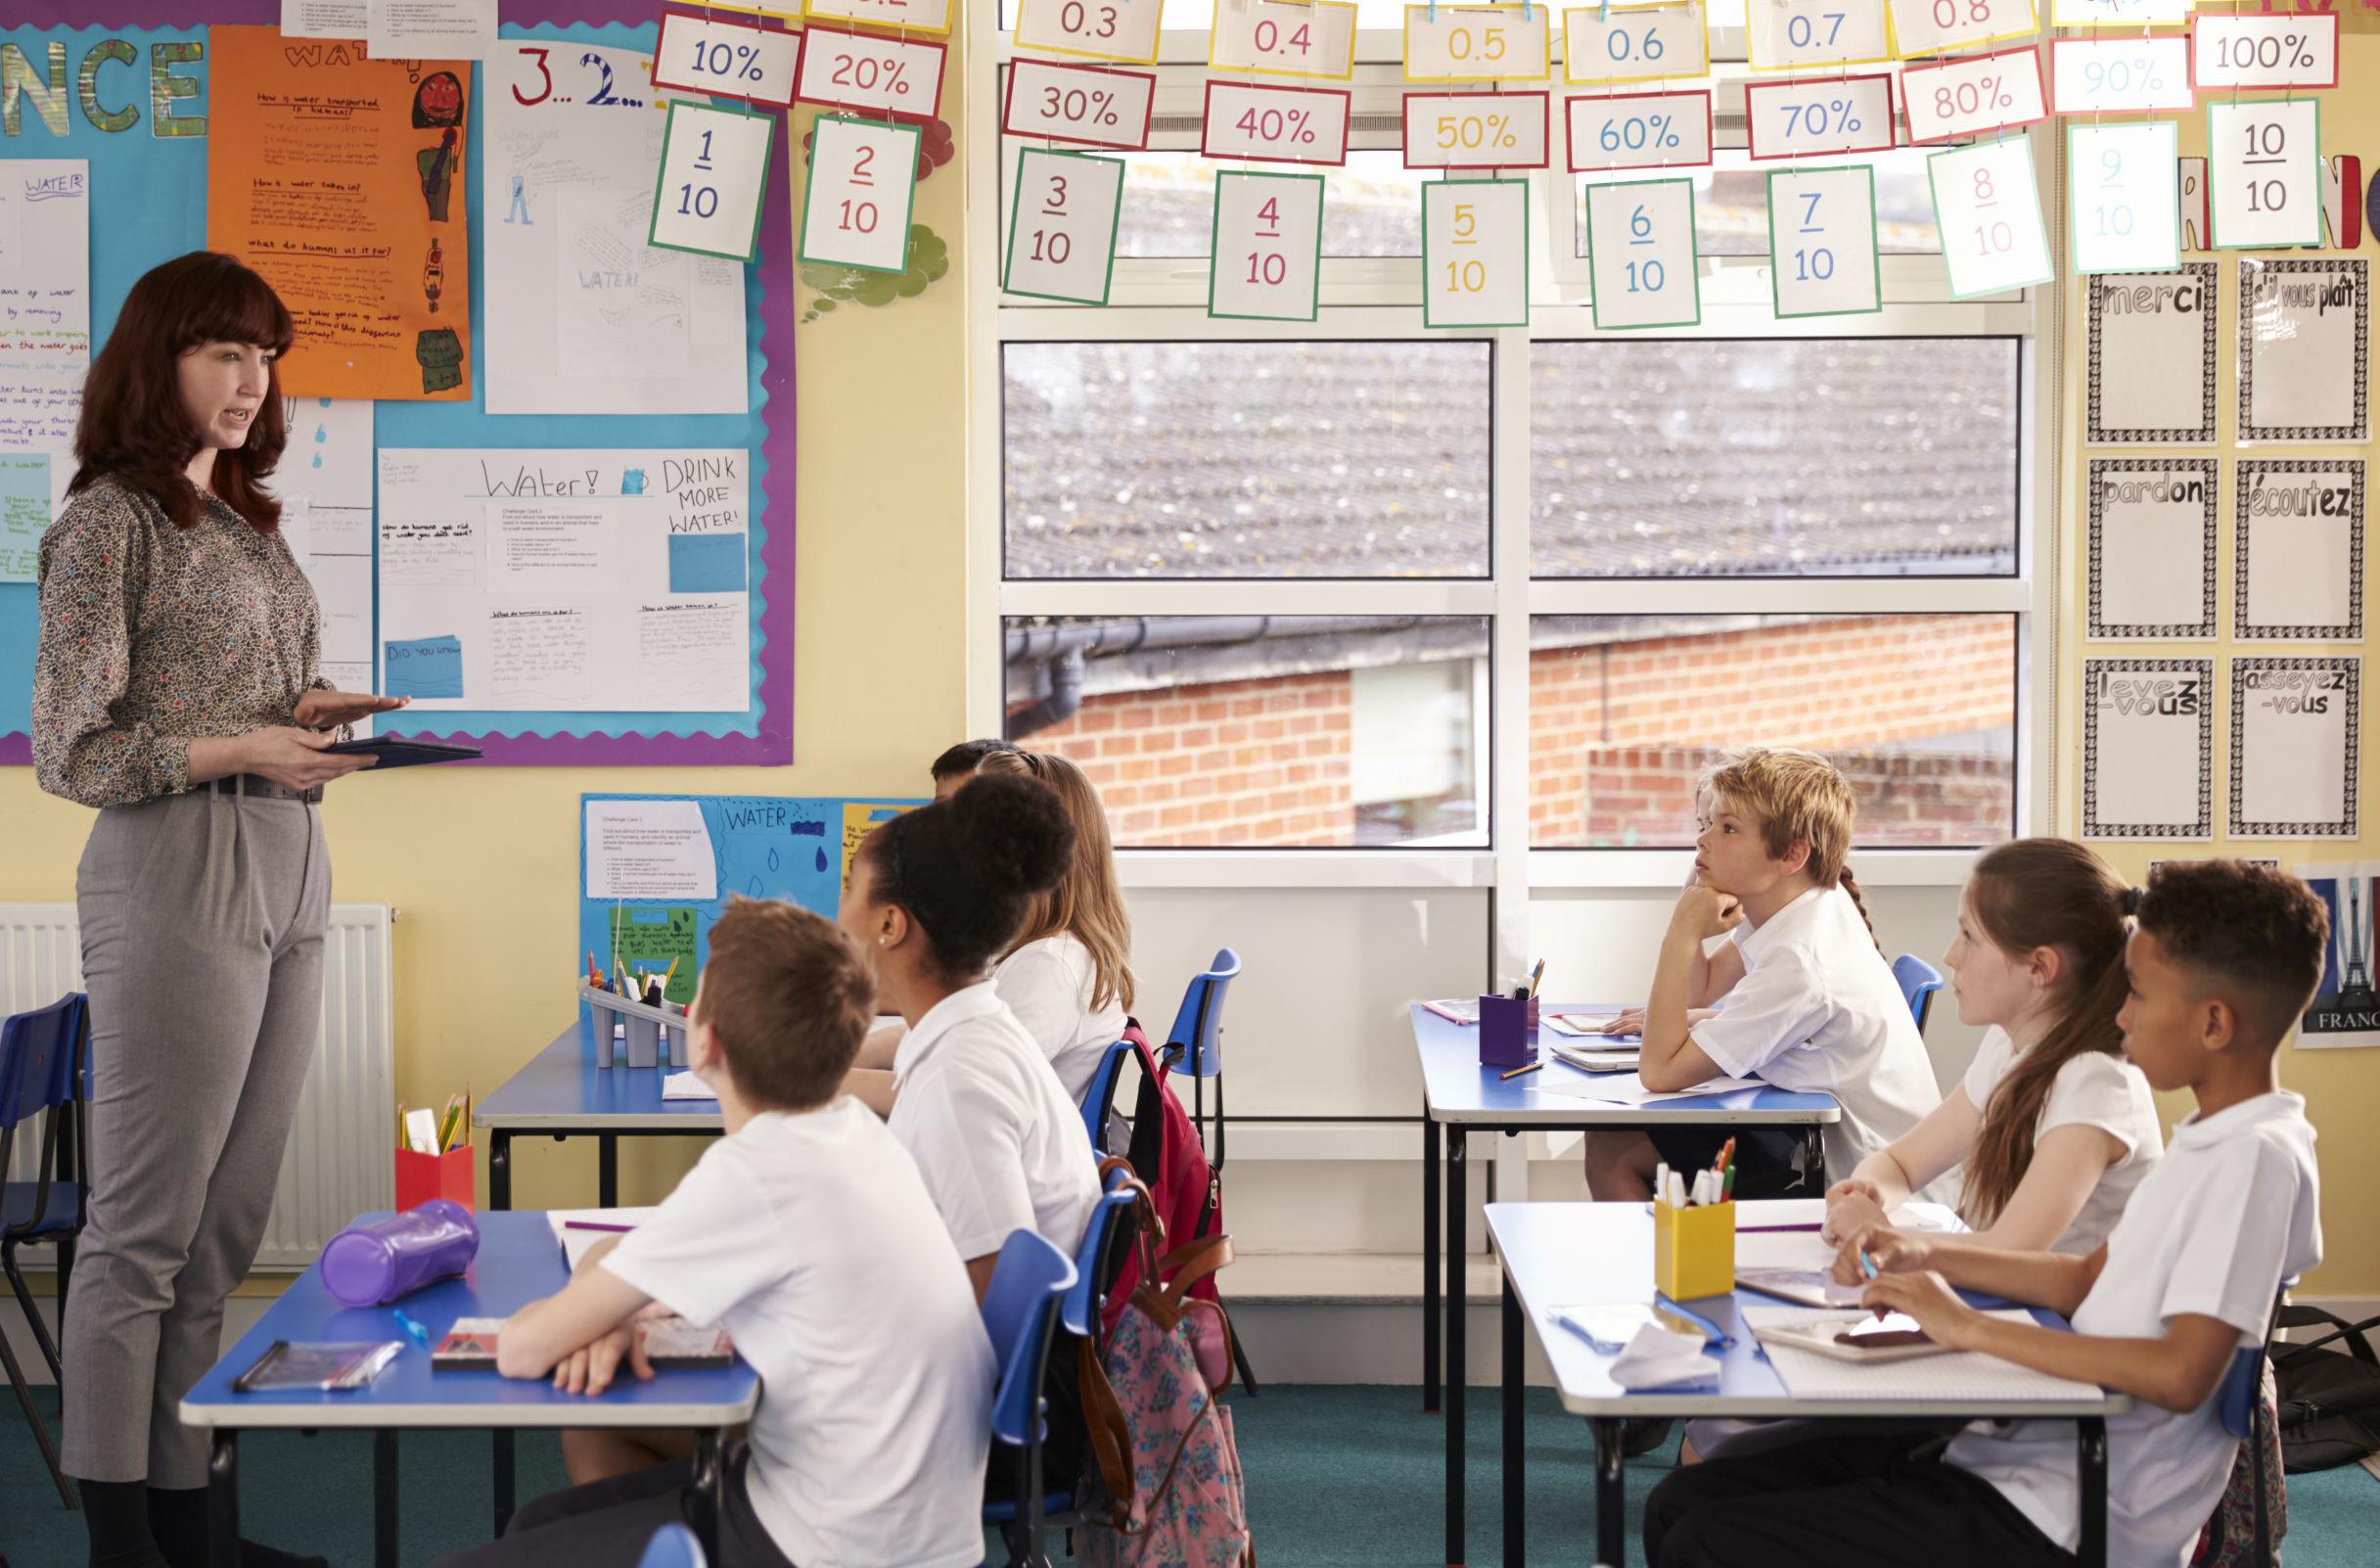 In classroom teacher instructing students